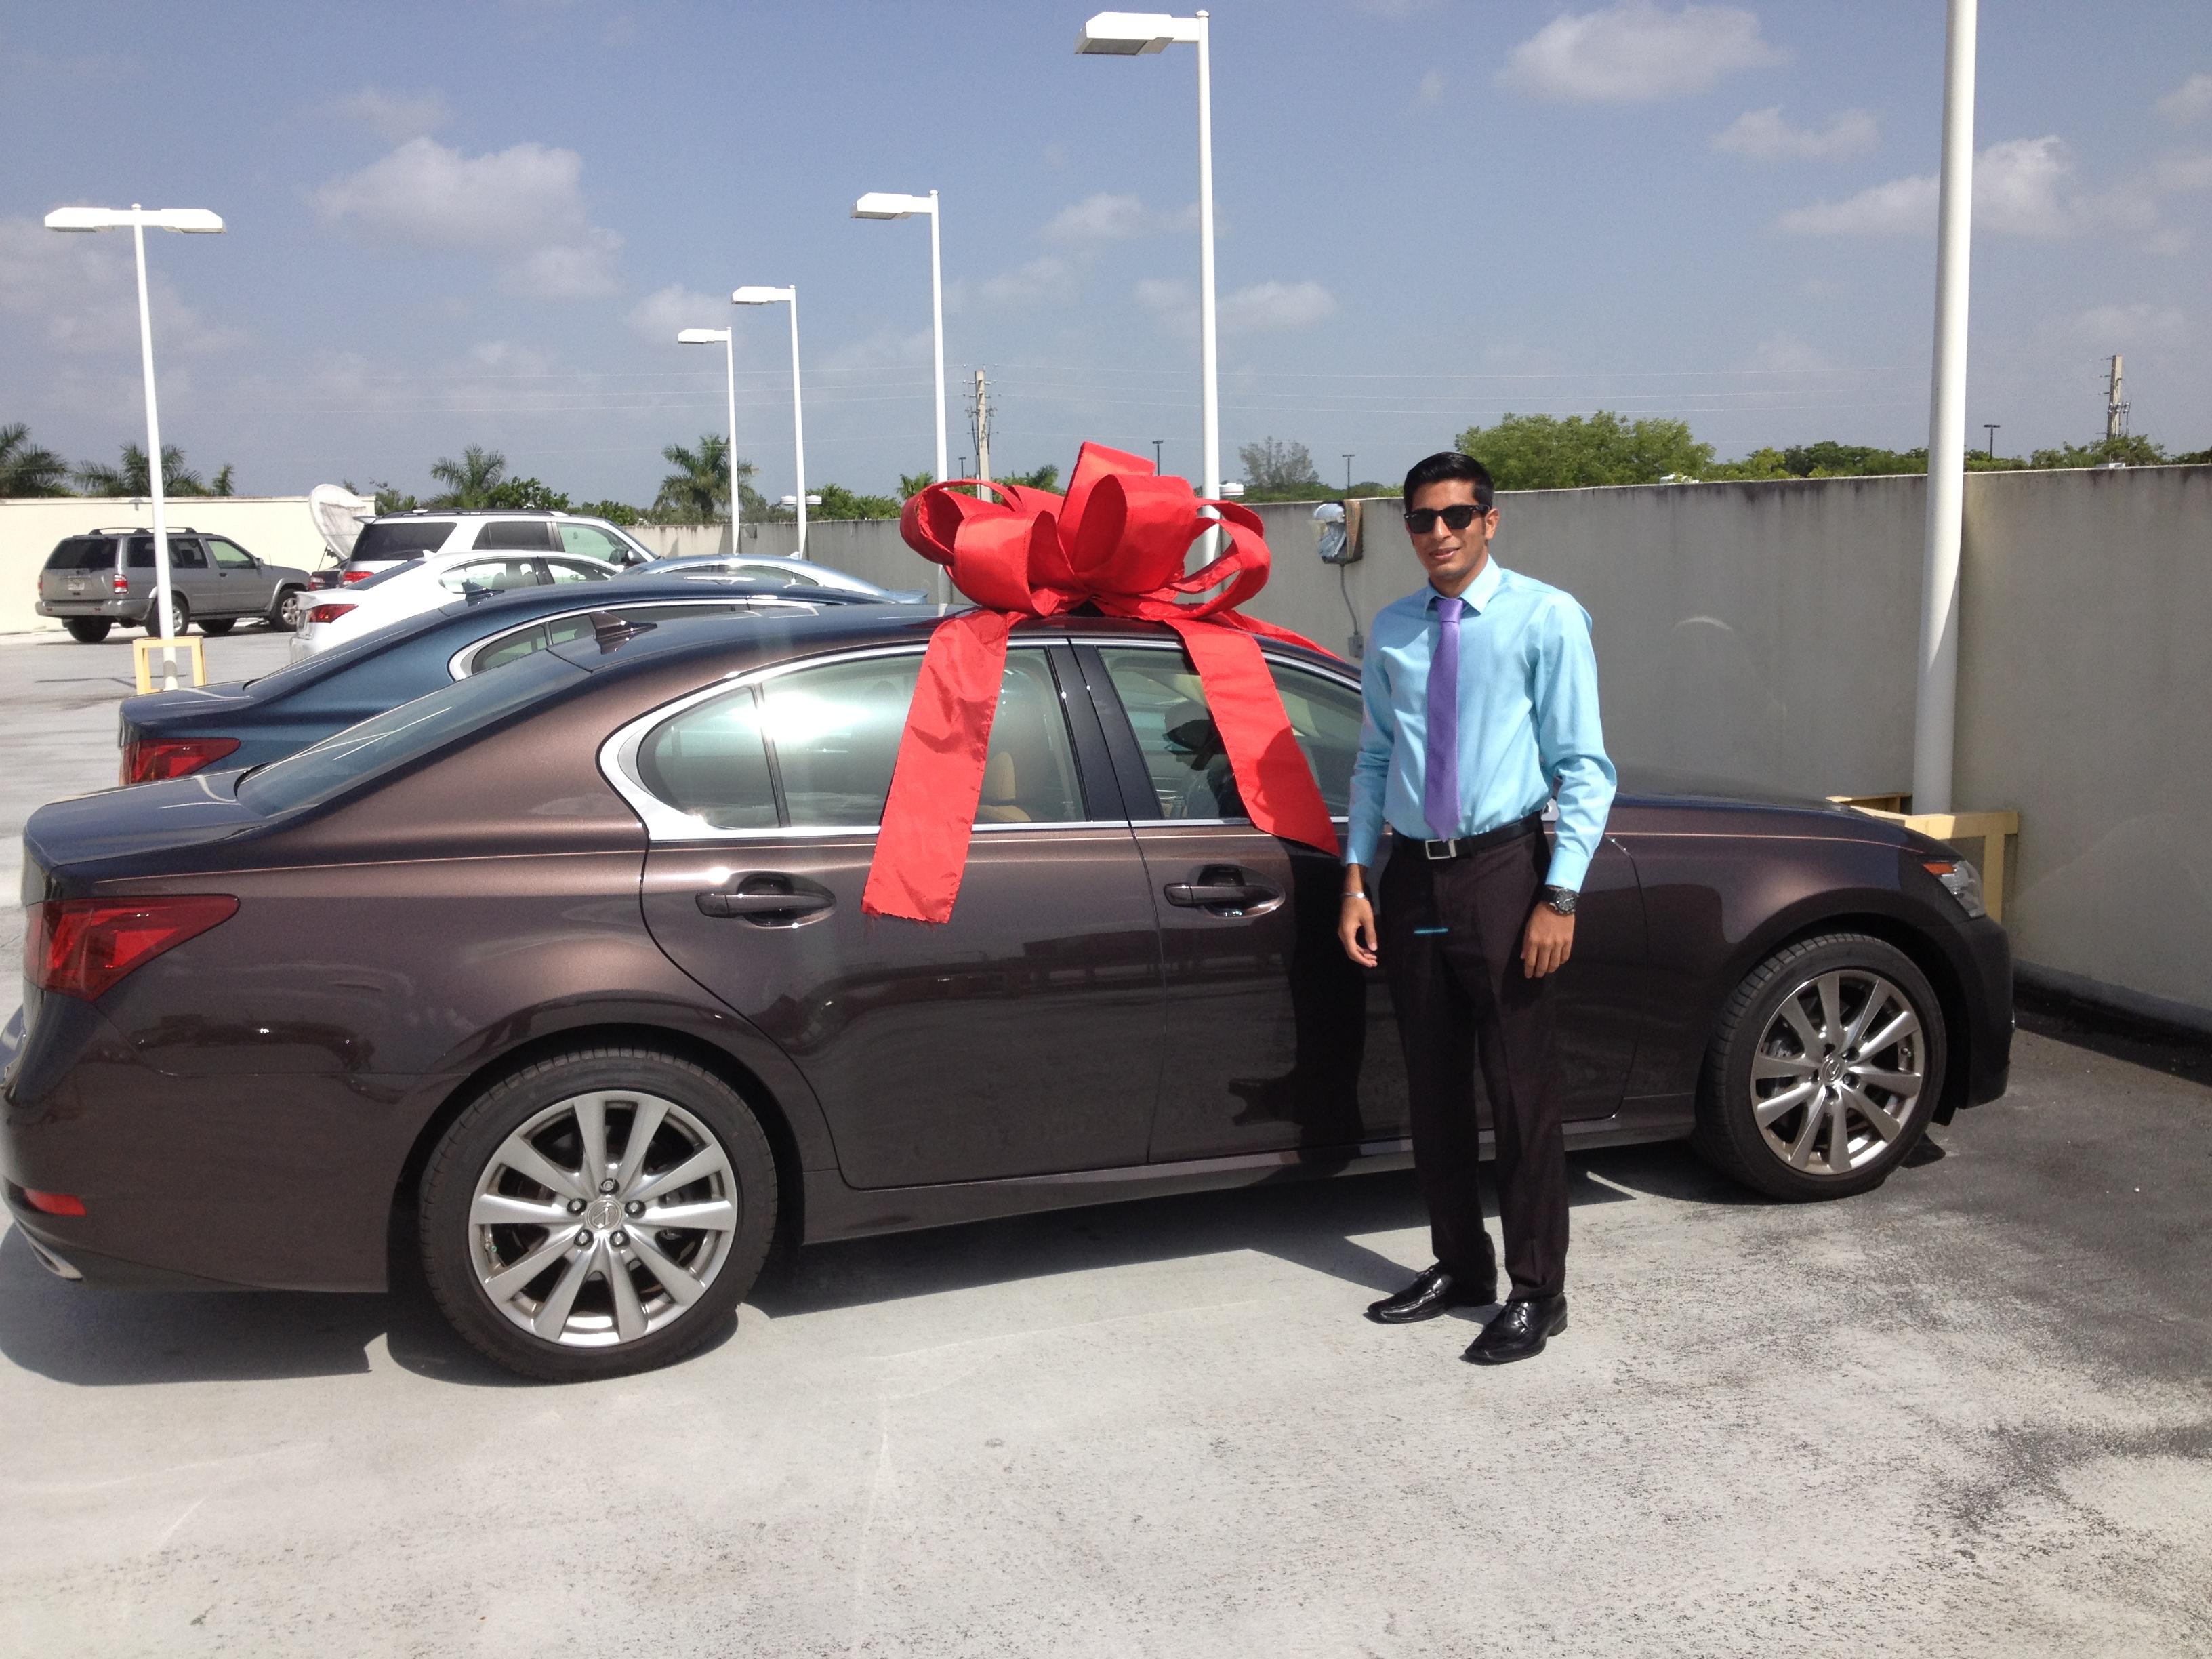 Los Angeles Lexus Service Coupons >> Lexus of Pembroke Pines Coupons Pembroke Pines FL near me | 8coupons